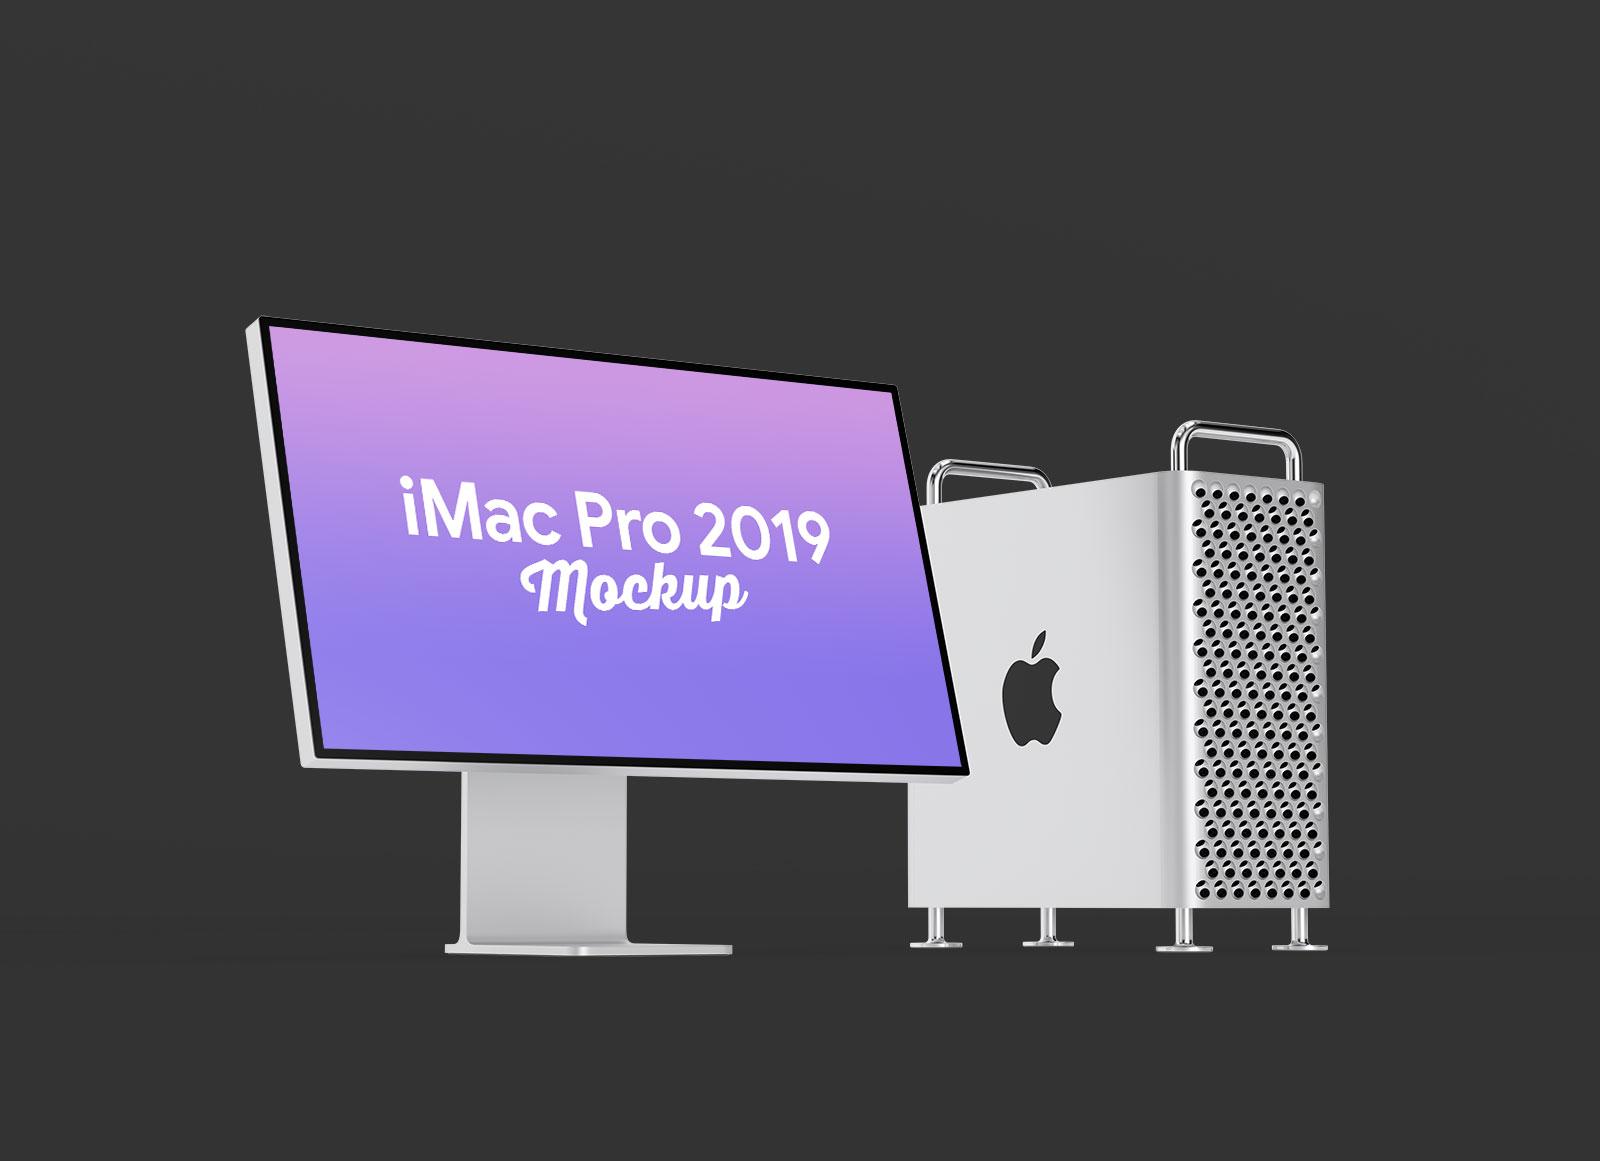 Free-iMac-Pro-2019-Mockup-PSD